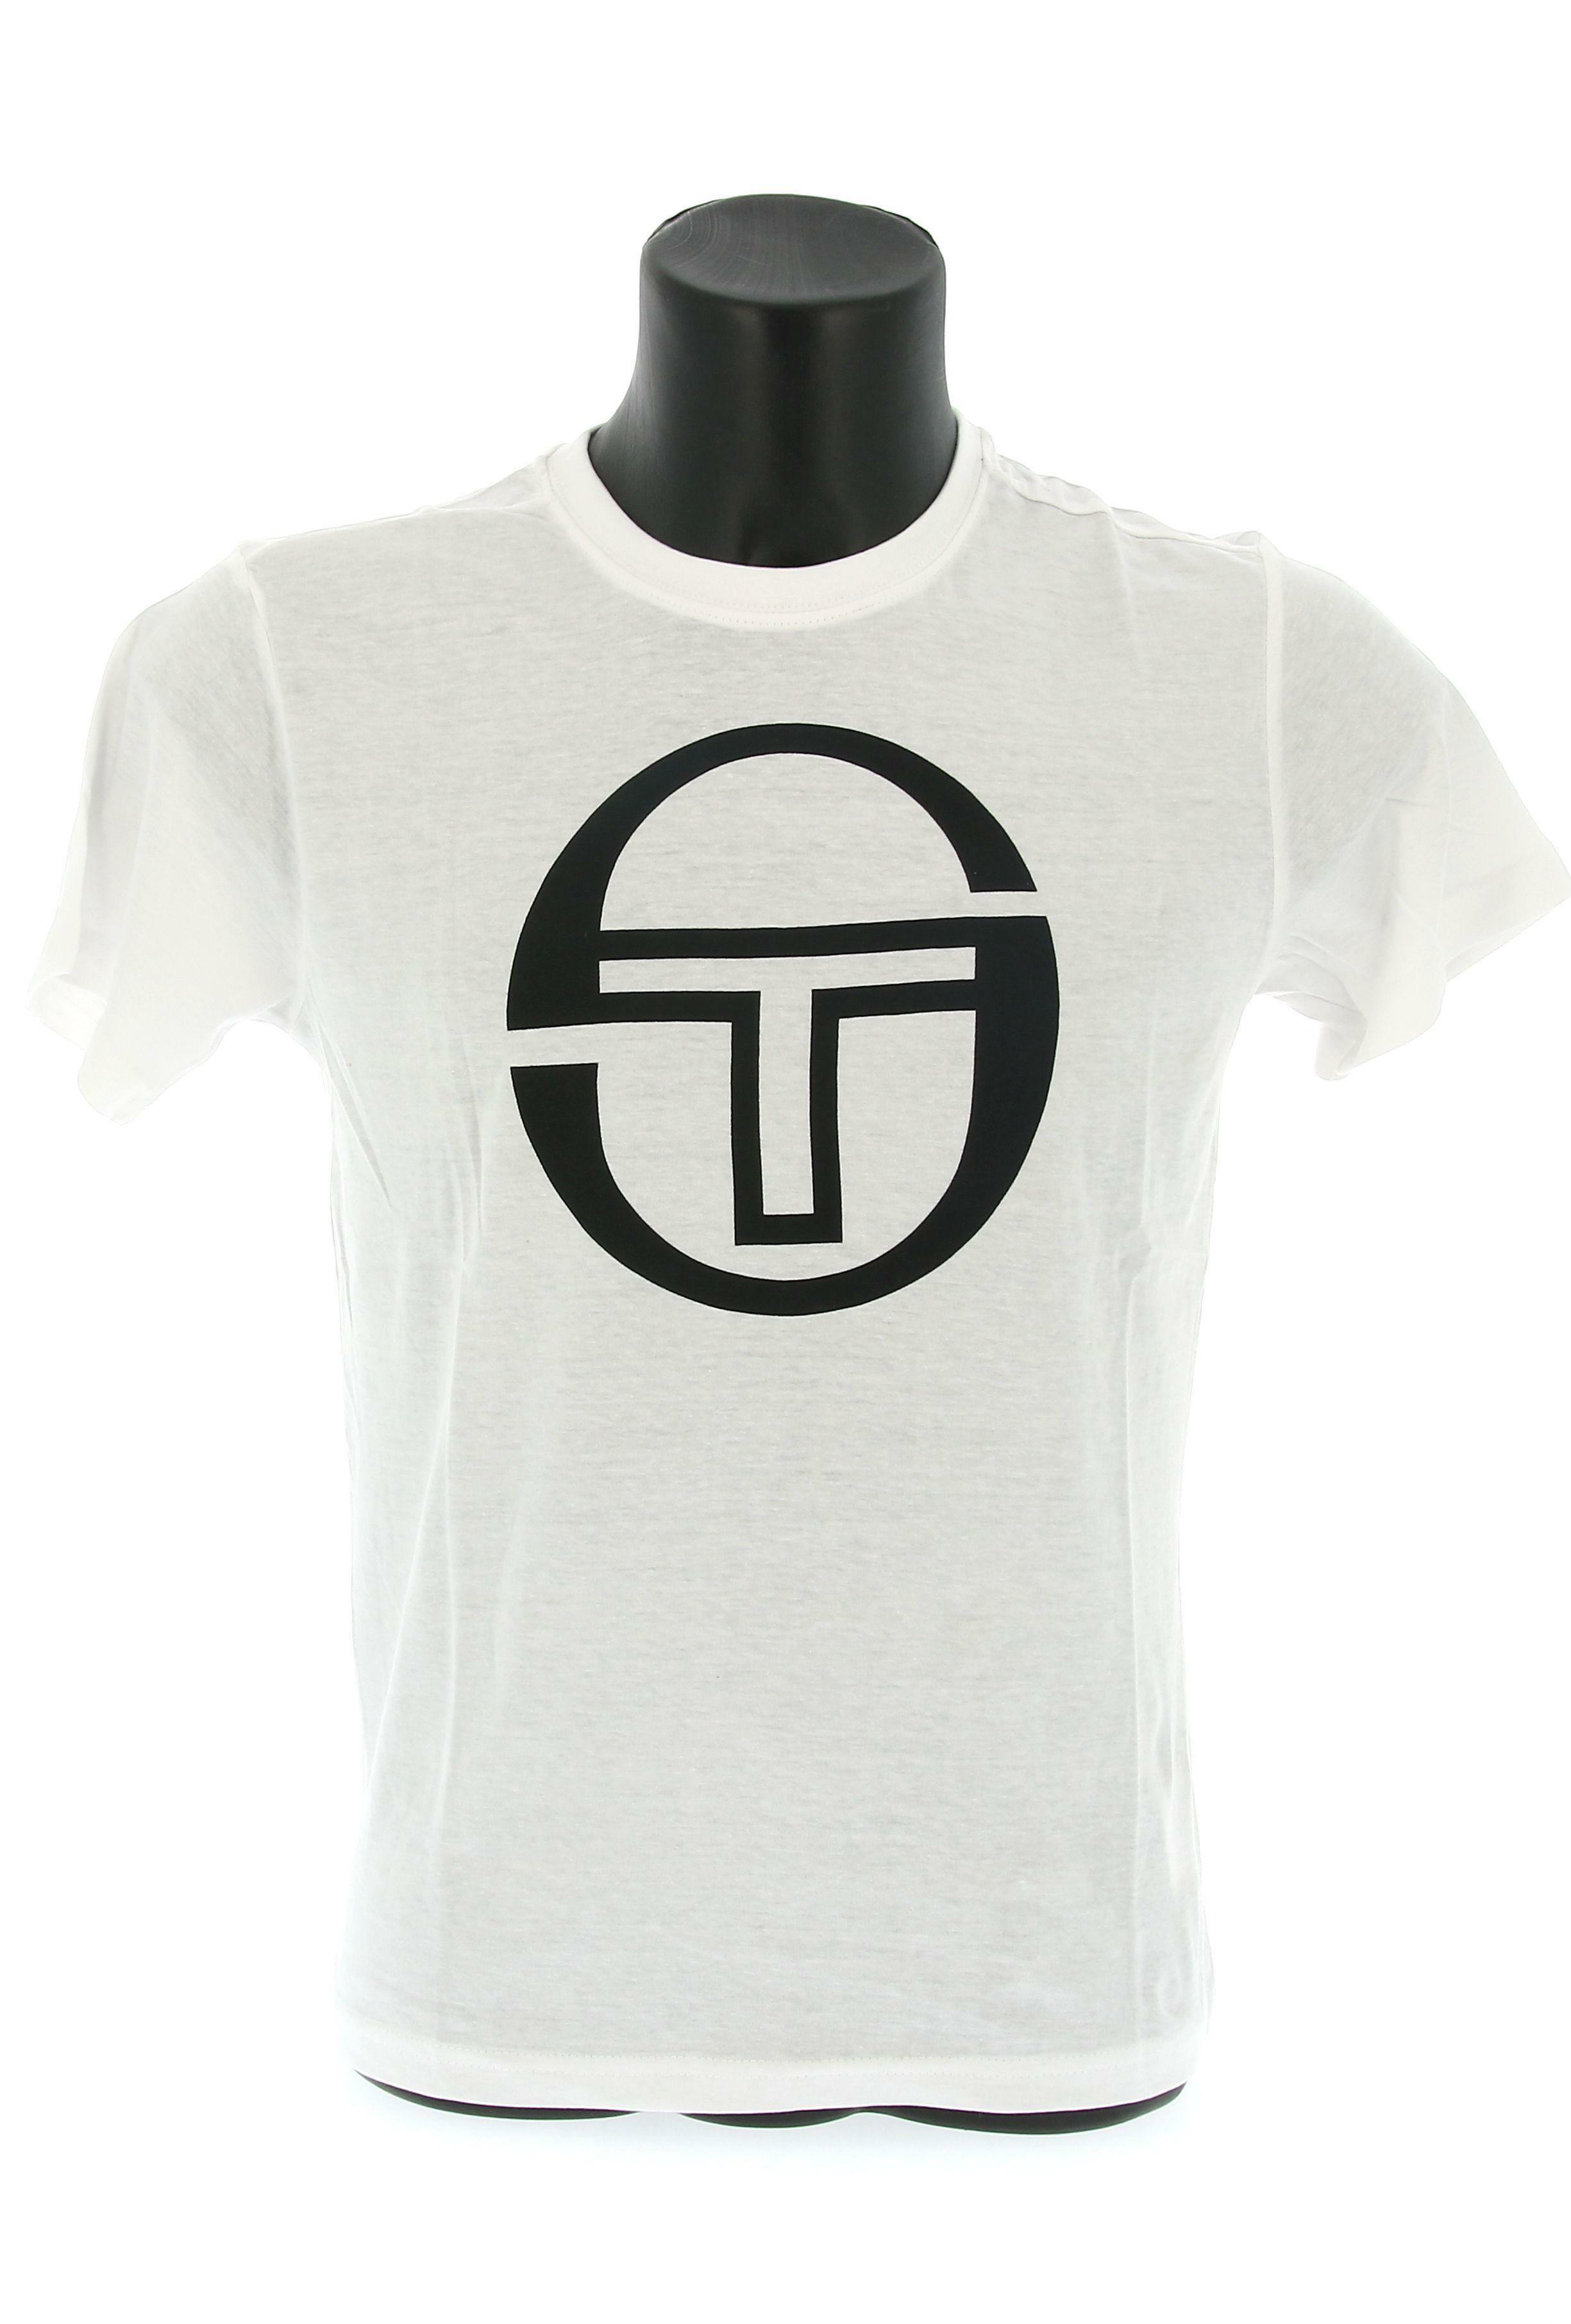 sergio tacchini sergio tacchini ss t-shirt stadium 10008  manica corta uomo bianca